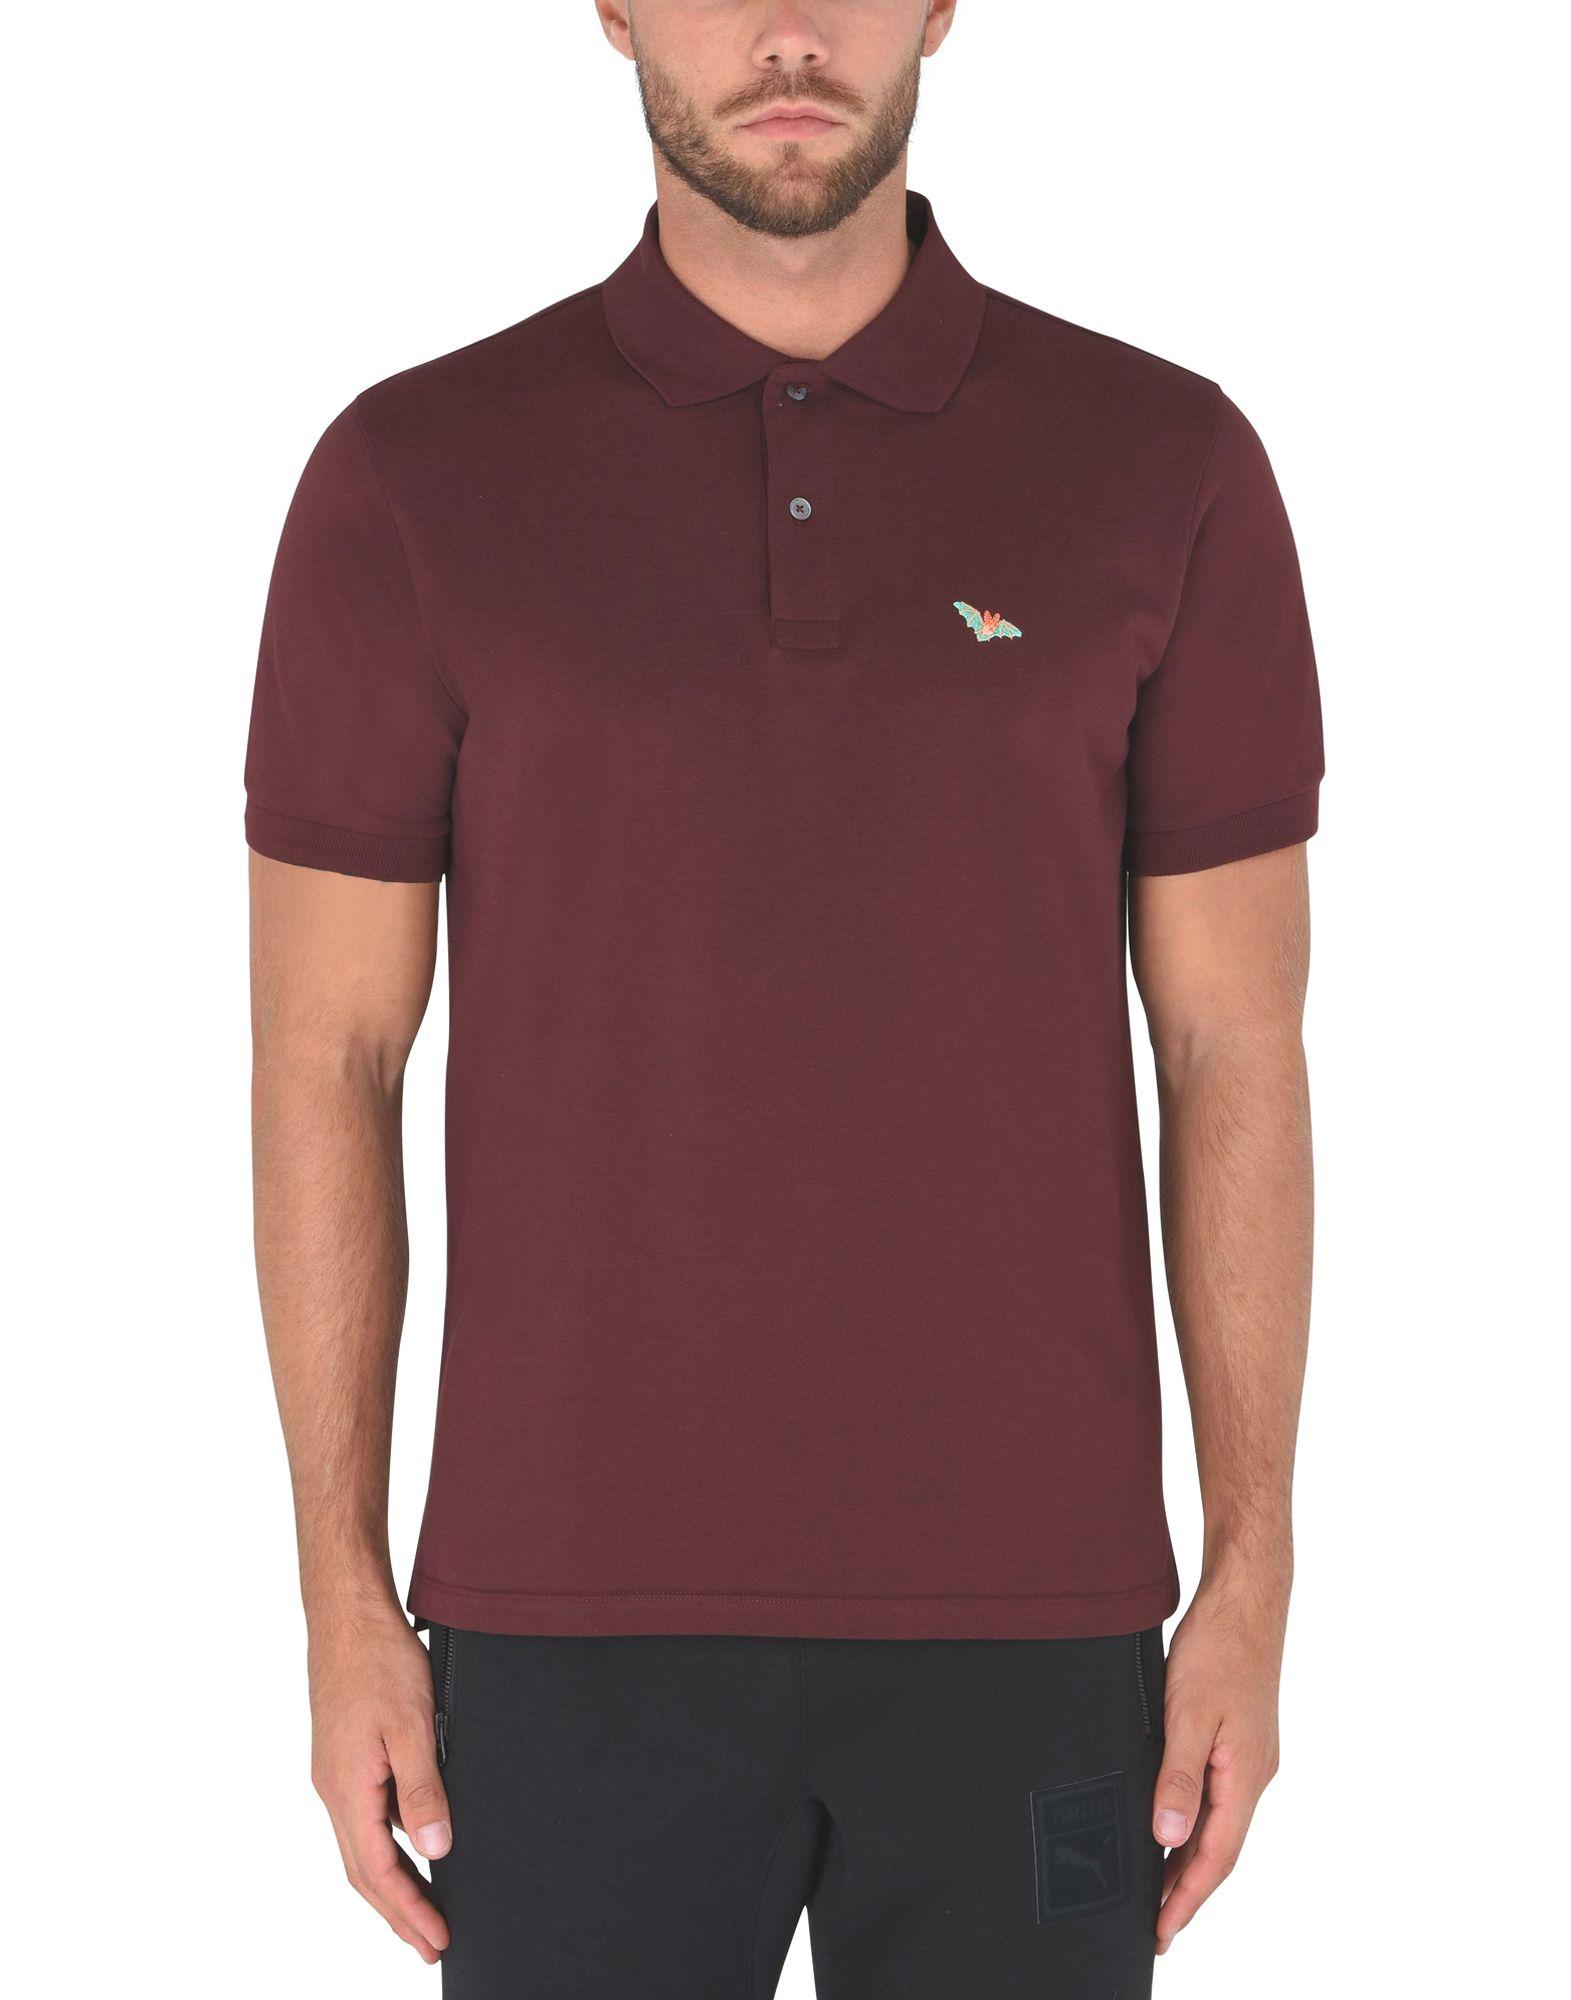 Polo Paul 12066741HN Smith Gents Polo Shirt - Uomo - 12066741HN Paul bf907b